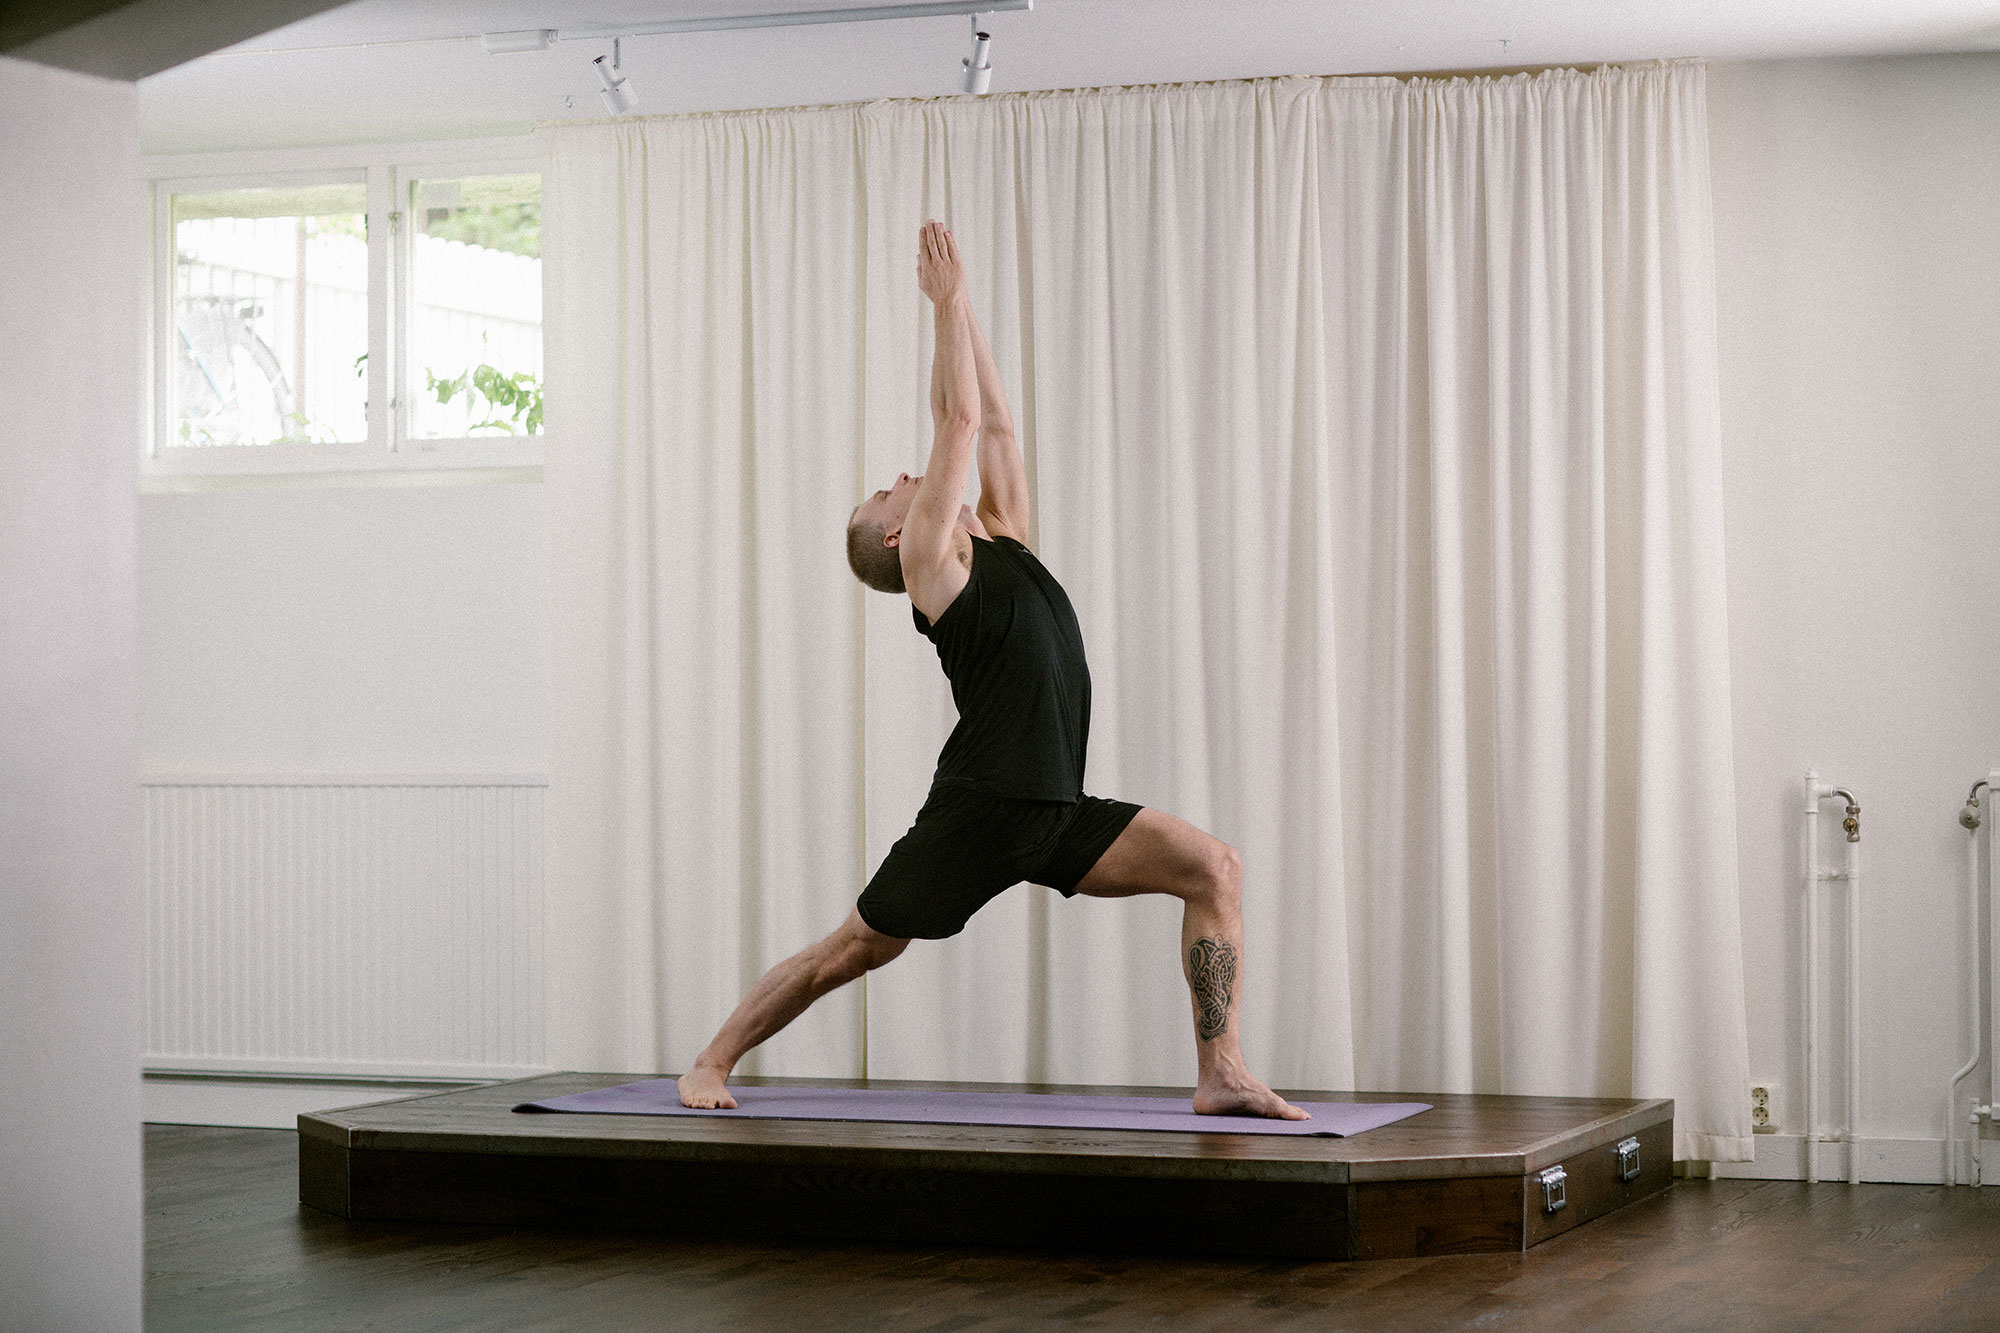 MG_Yogastudion_Joakim_yogaposition_2000px.jpg